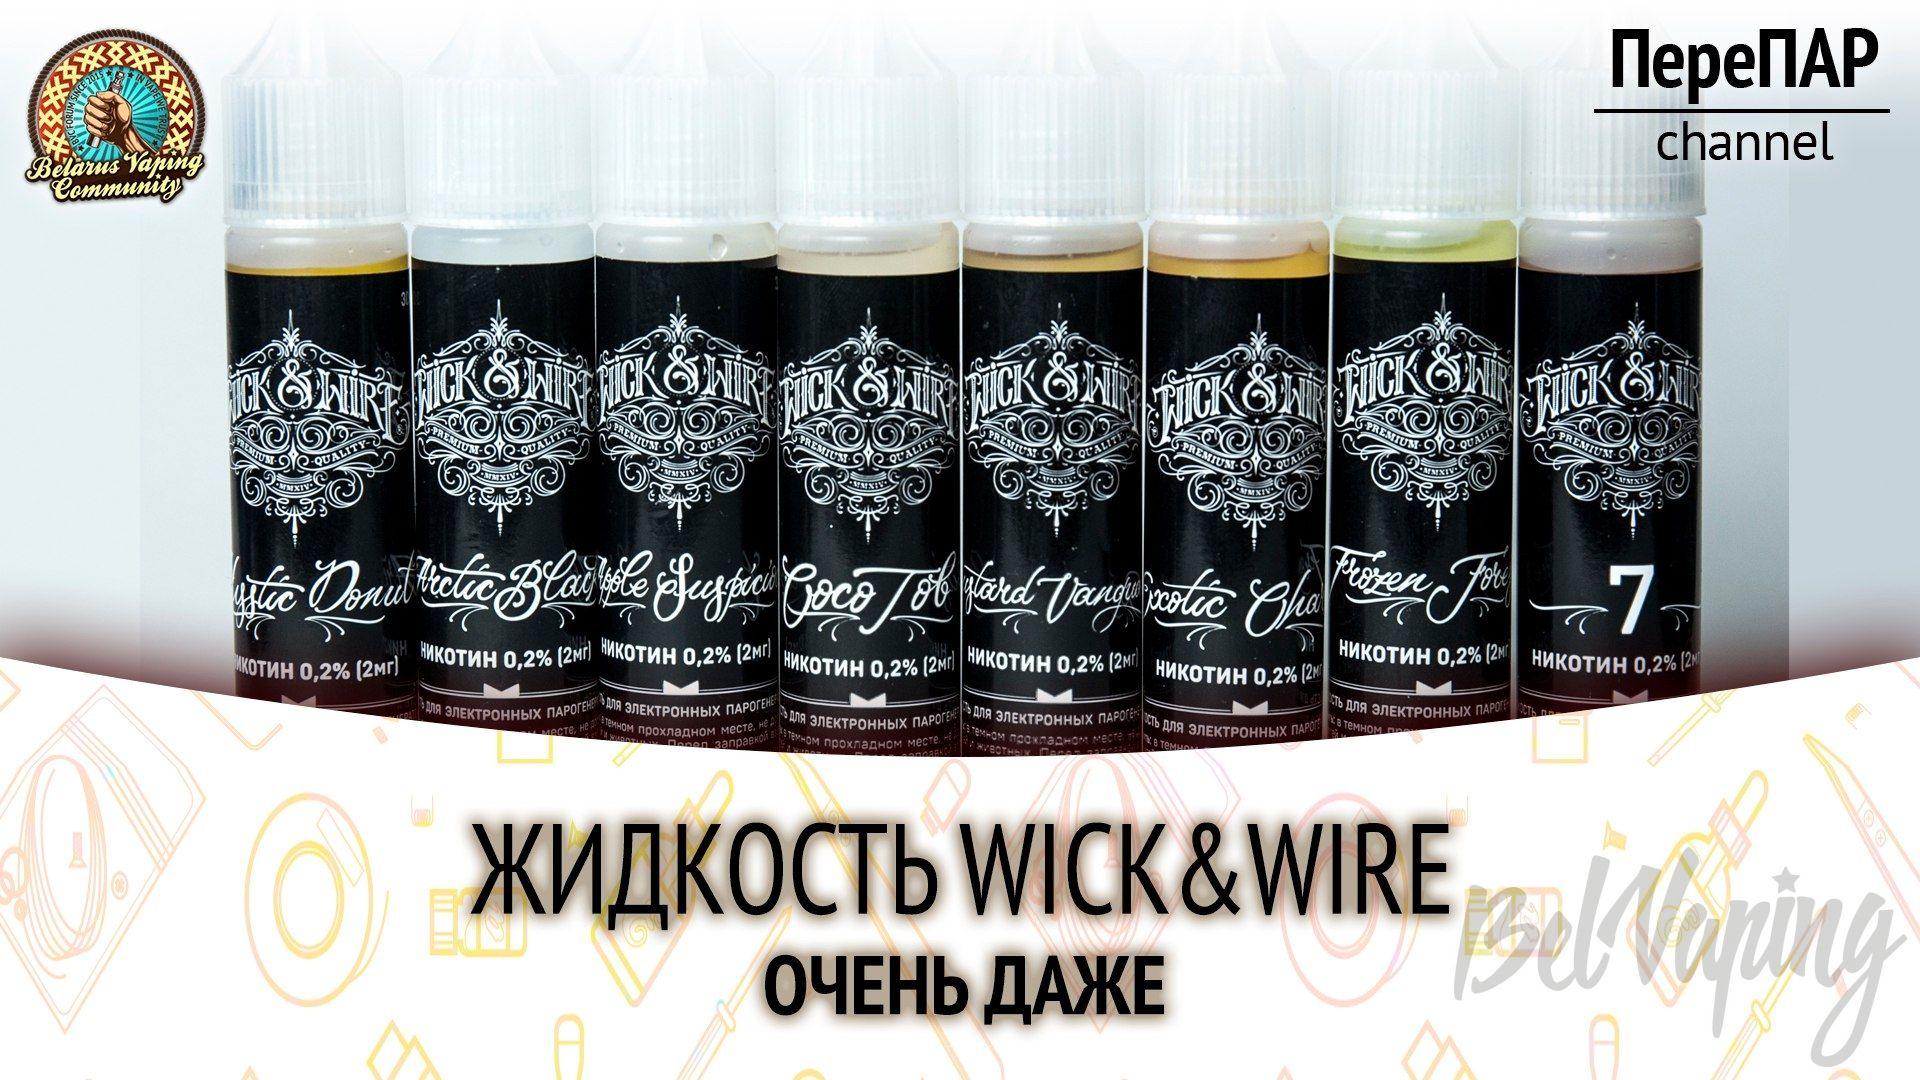 Обзор жидкости для вейпинга Wick & Wire